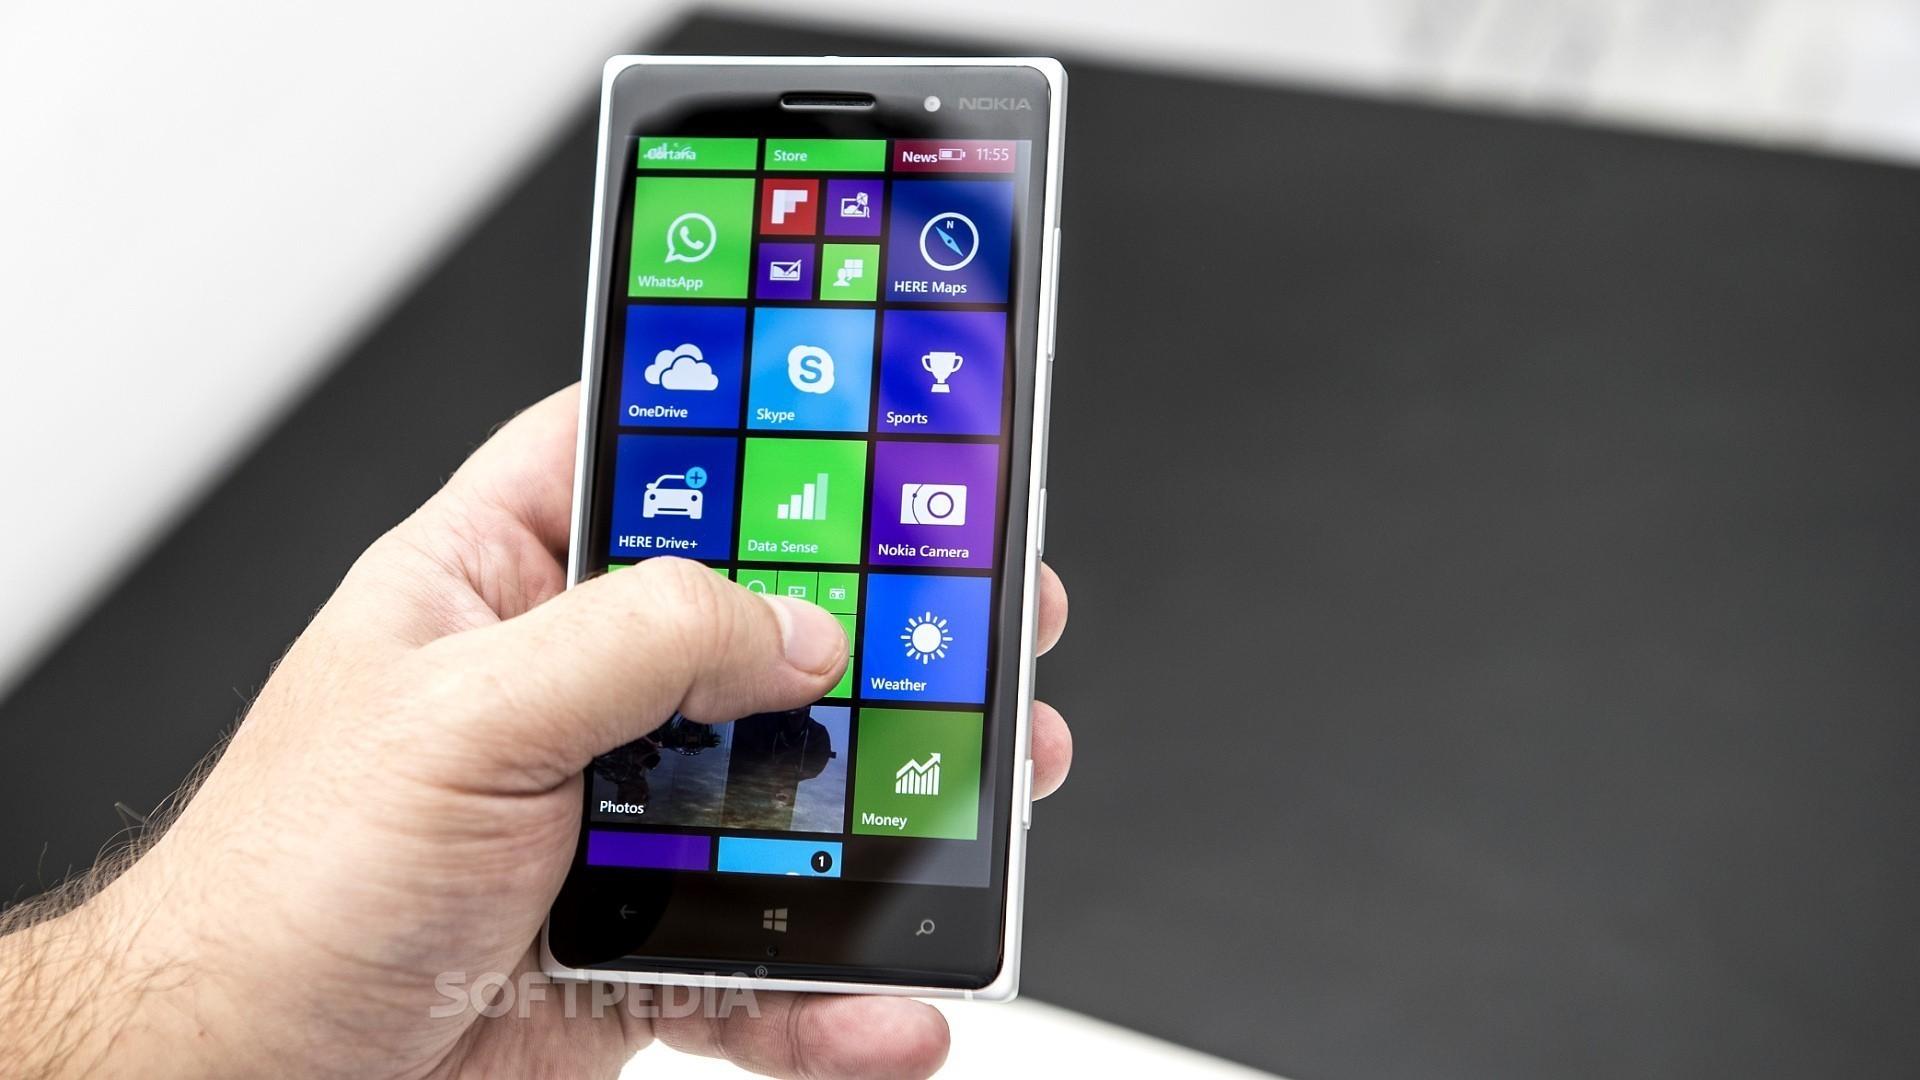 Microsoft Breaks Down Updates On Windows Phone 8 1